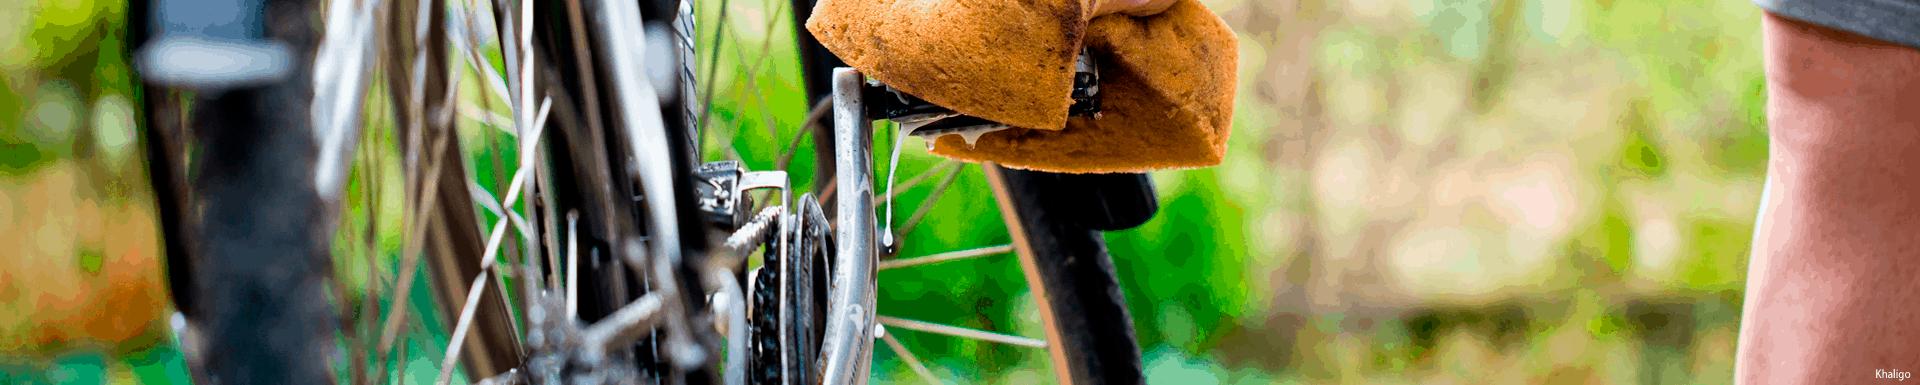 Limpeza da bicicleta com WD-40 BIKE